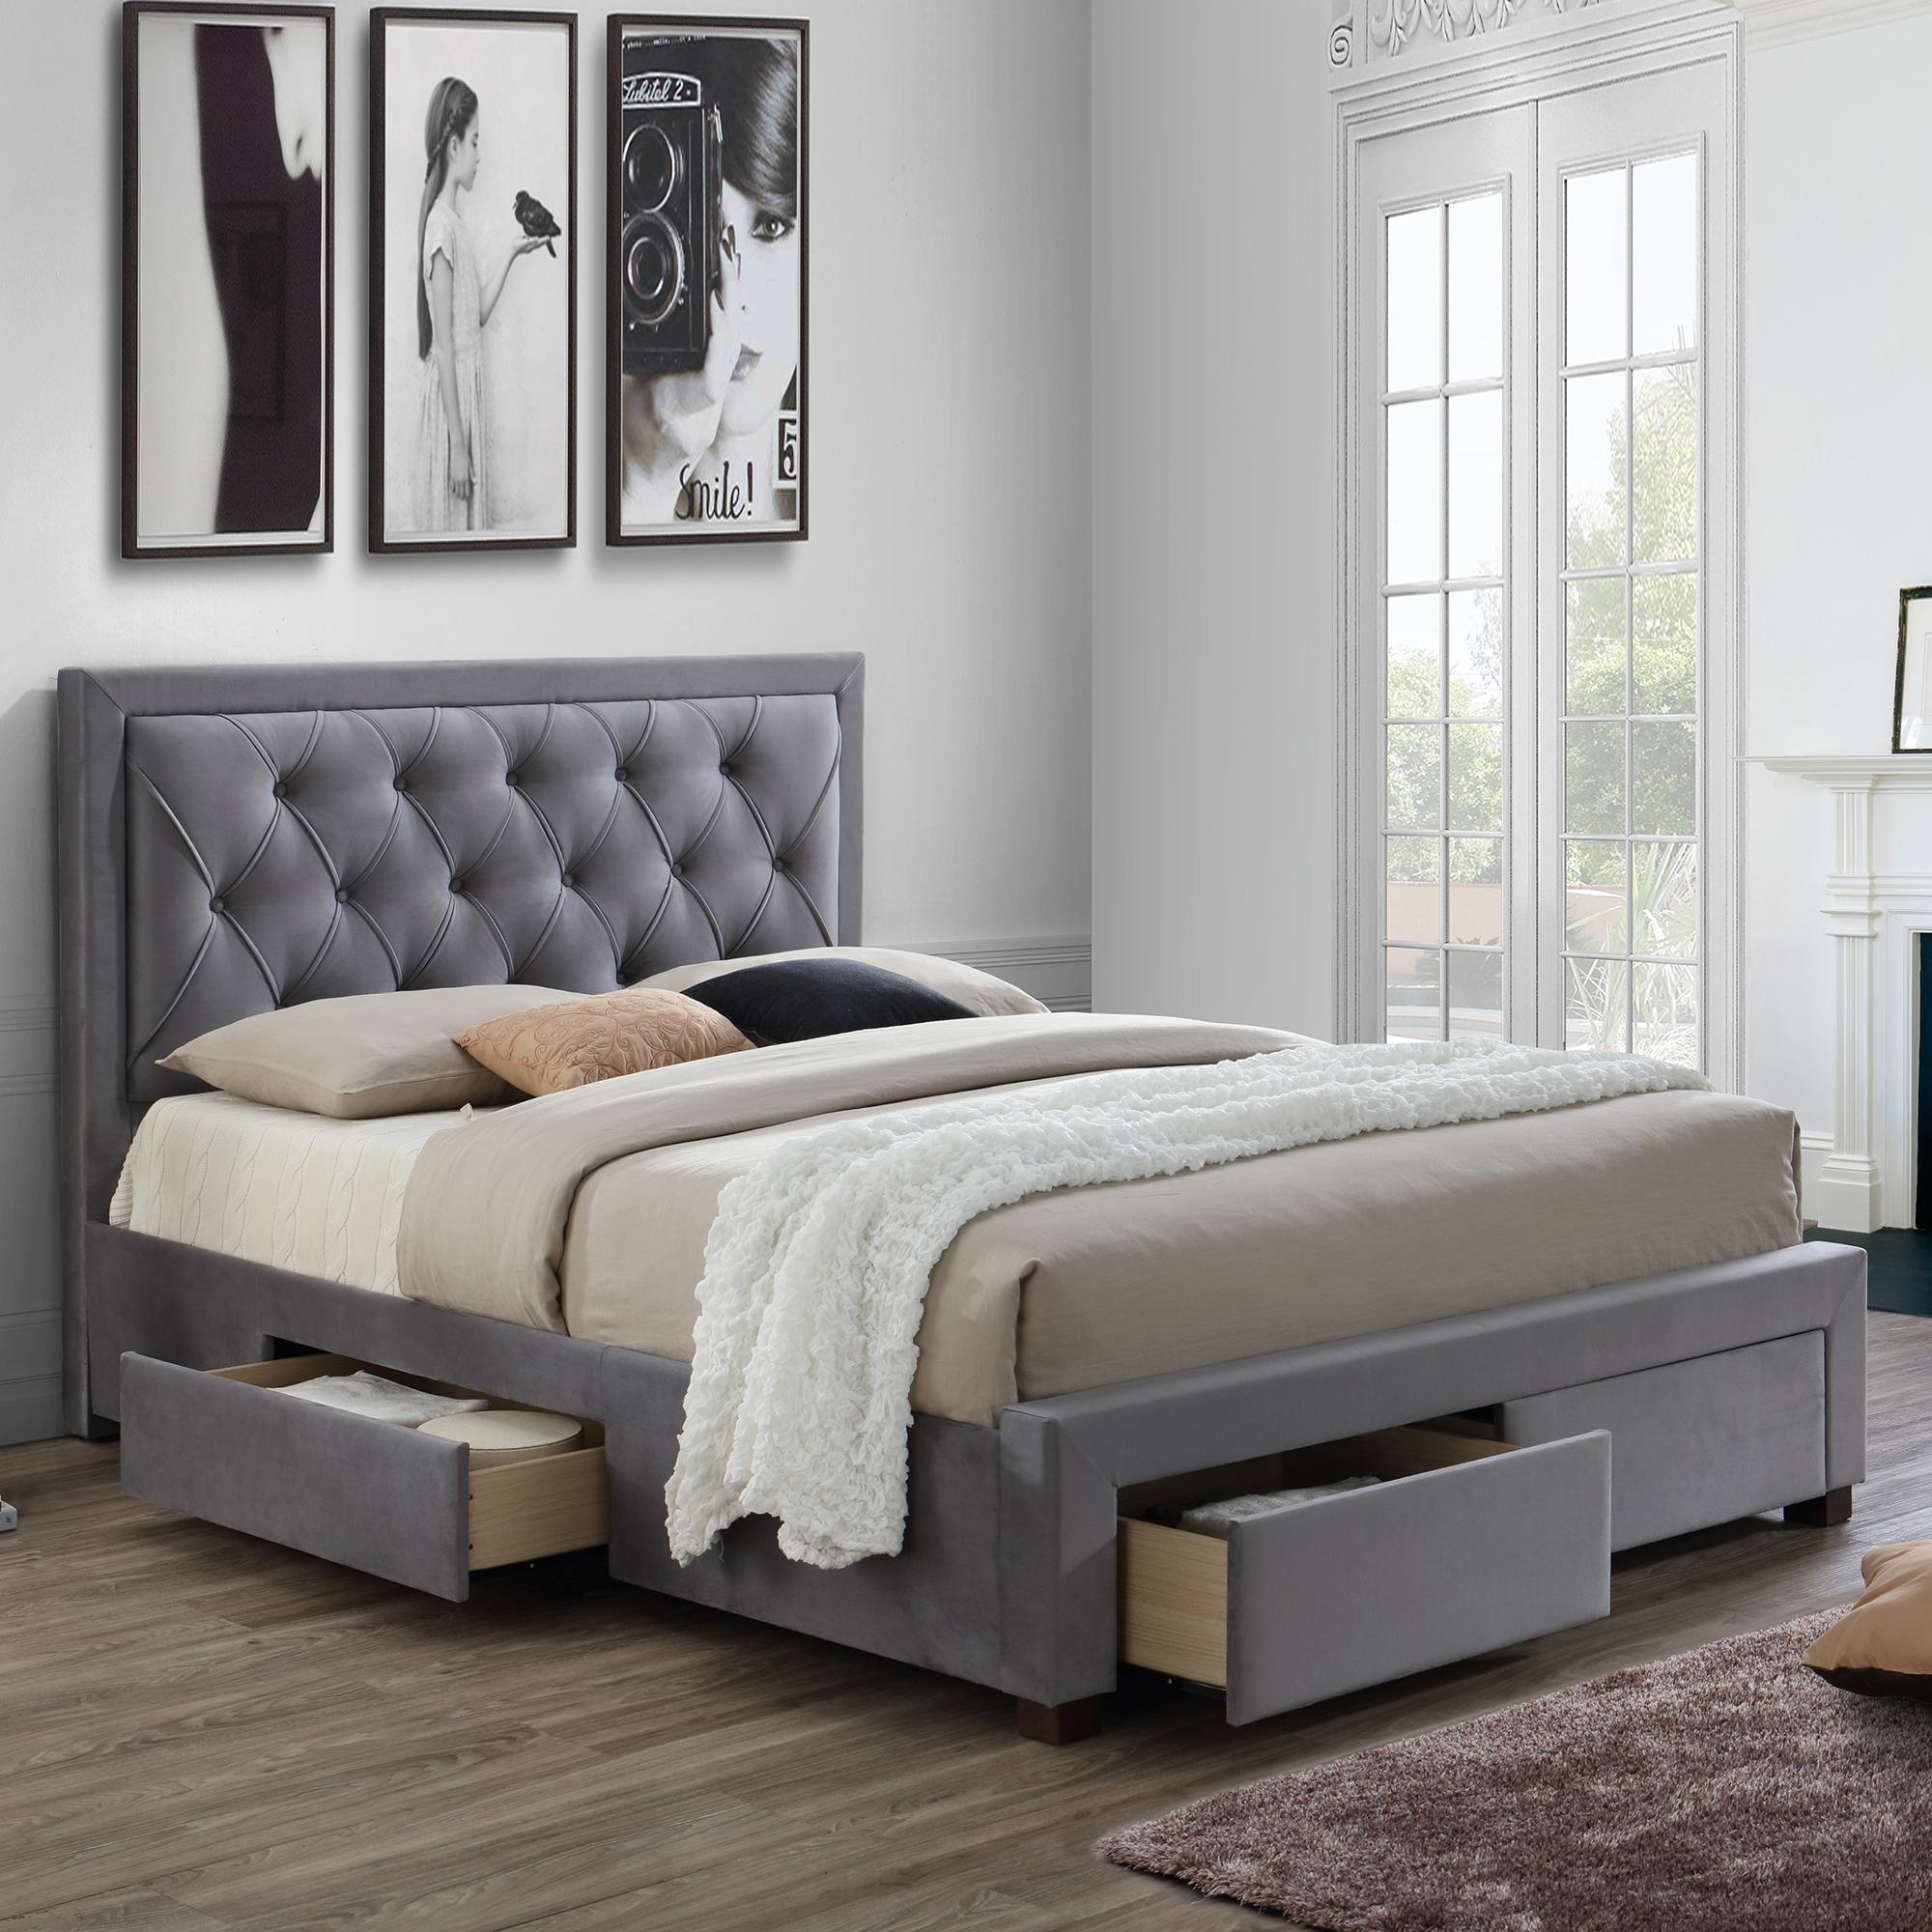 Lumburn Slatted Storage Bed Frame In Grey Fabric Bed Frames Fishpools